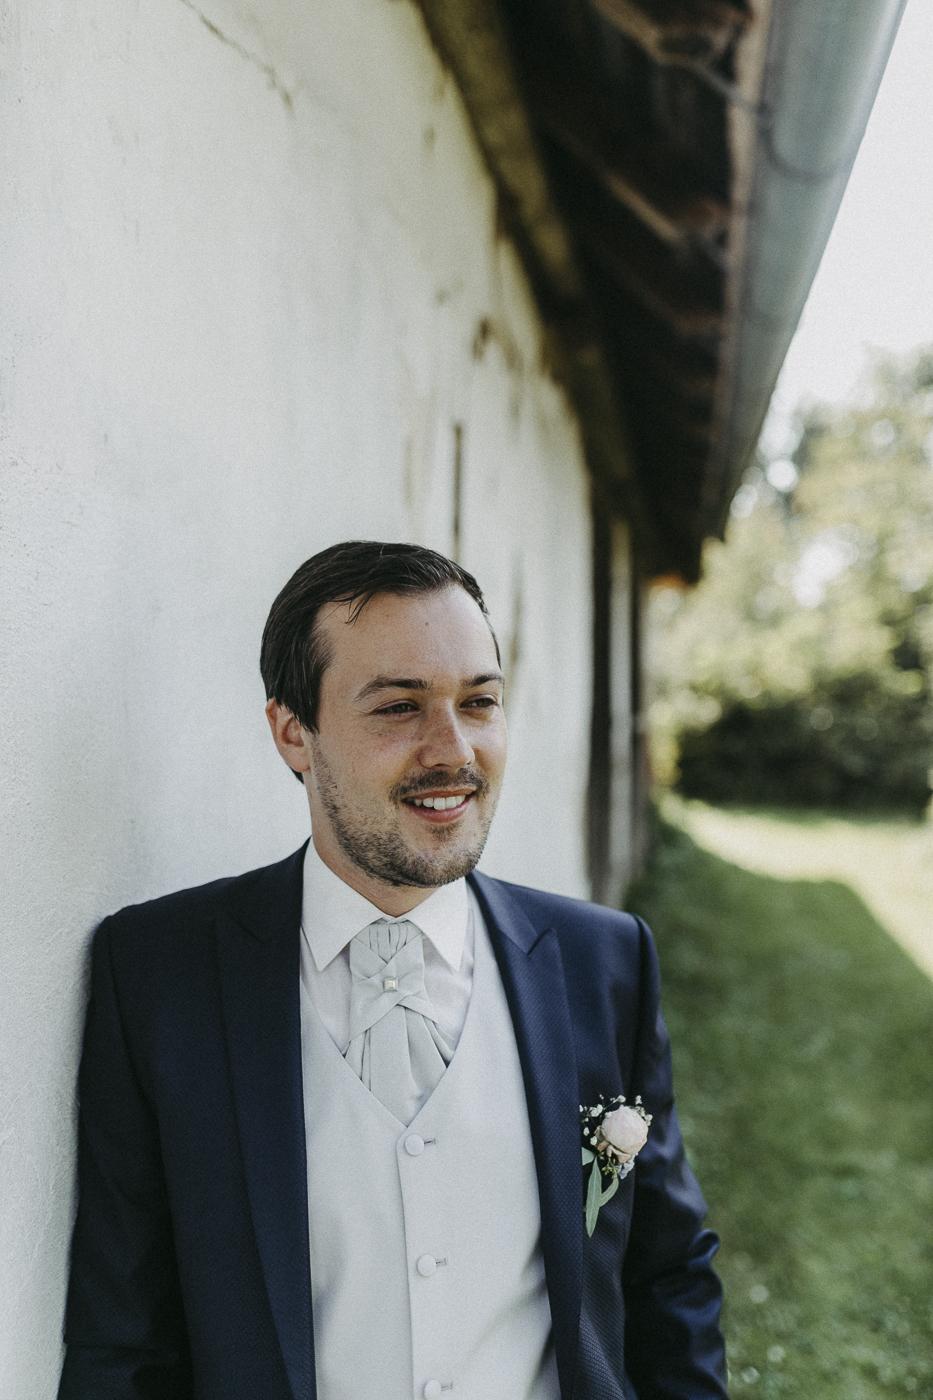 rosemarrylemon_ND_Hochzeit_Hochzeitsplanung12.jpg